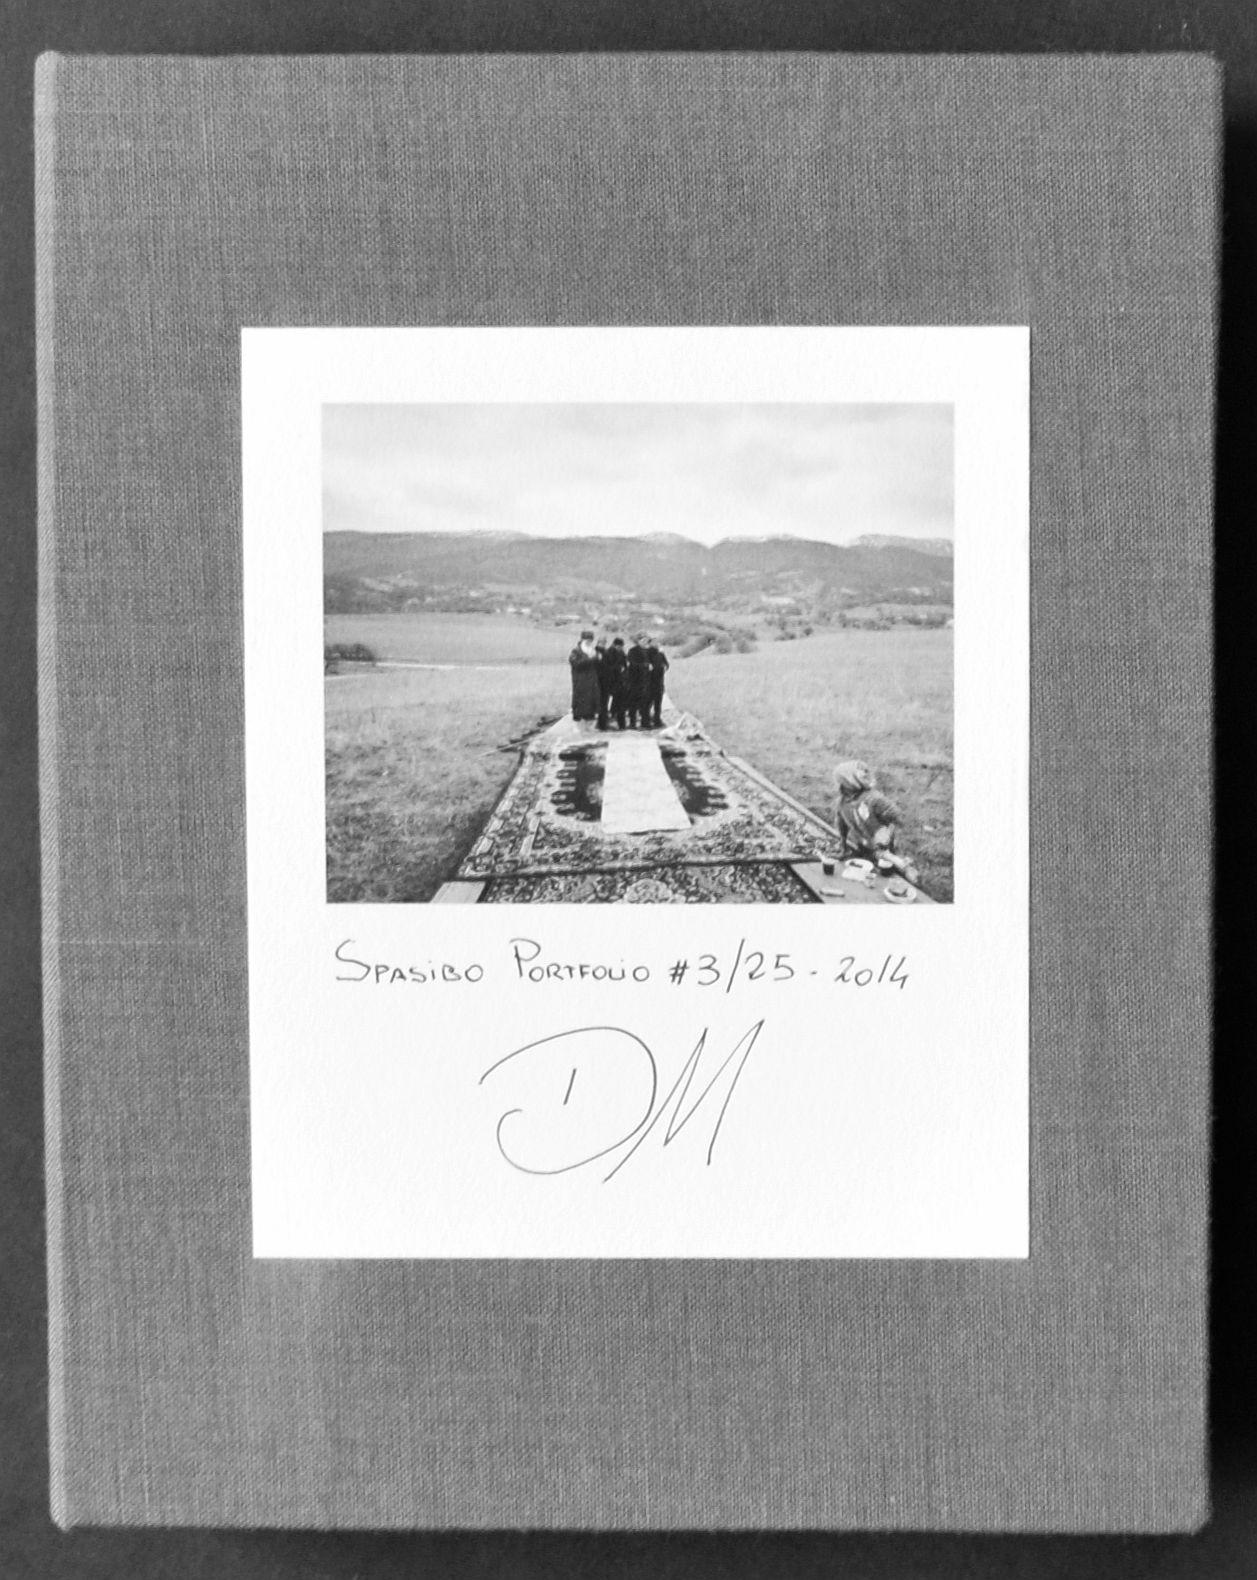 Spasibo. Contac Prints MONTELEONE, Davide (Potenza, 1974) Hardcover The portfolio of ''Spasibo Contac Prints'' is composed of 15 contact silver gelatin prints made from the original film (paper 12x16 cm - print 9x11 cm